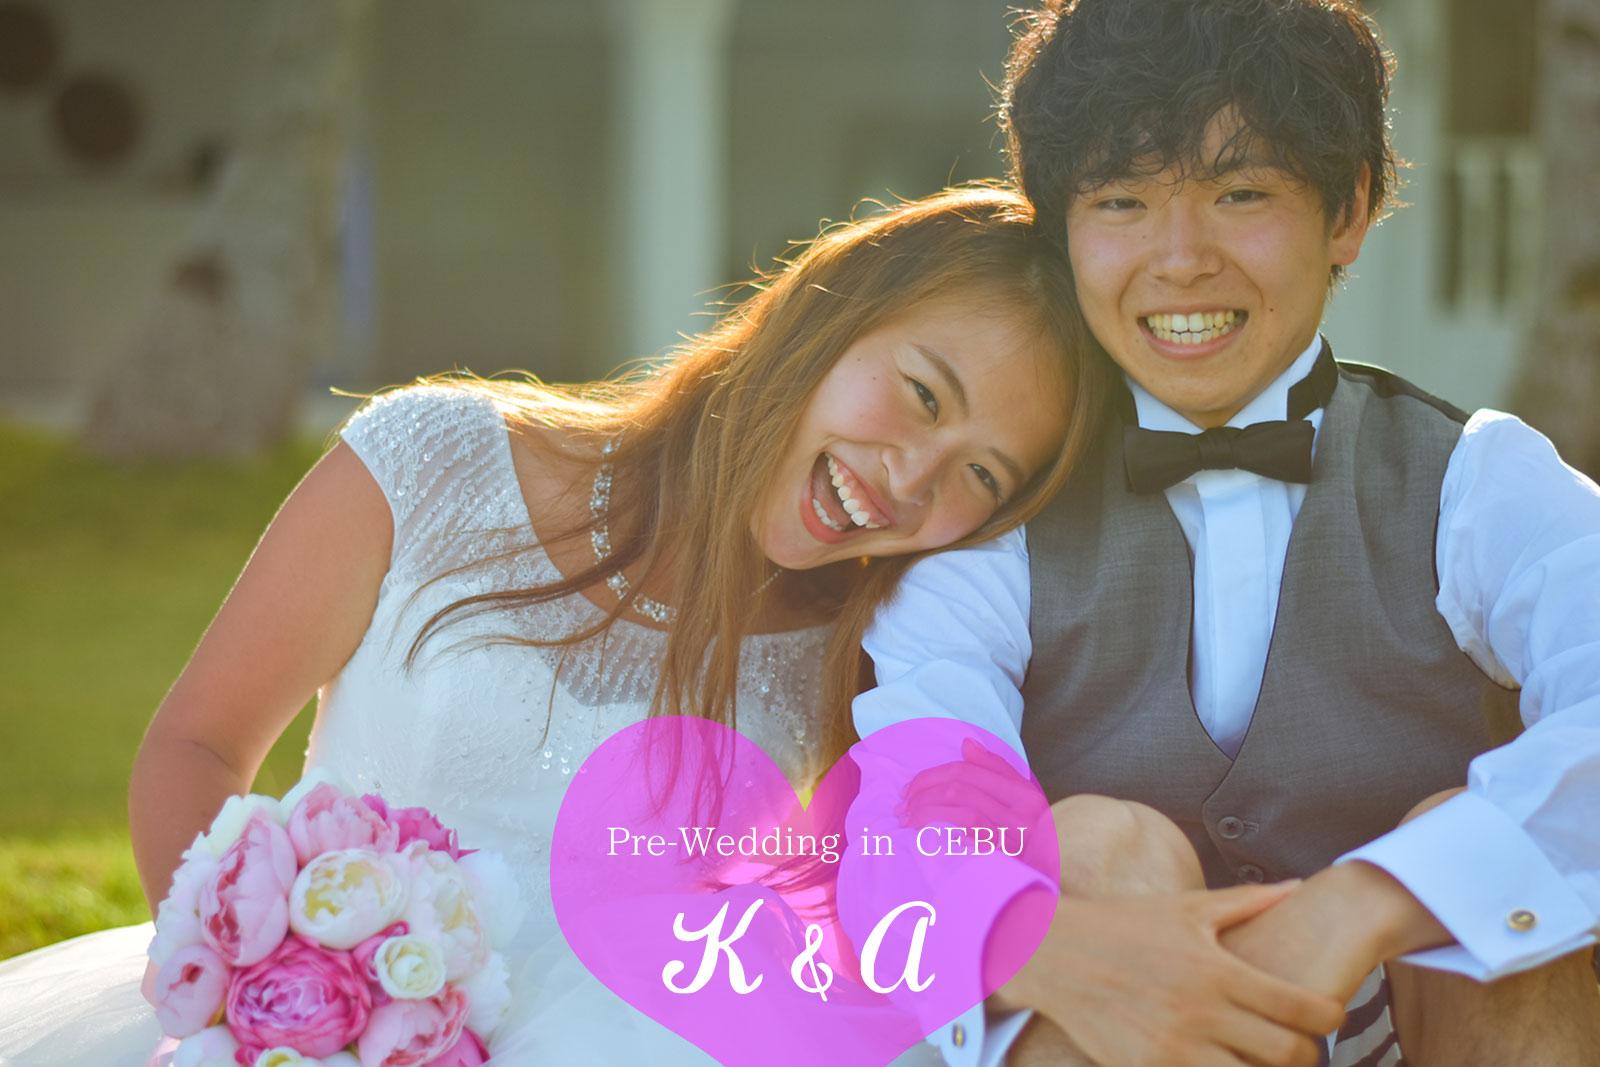 prewedding-in-cebu